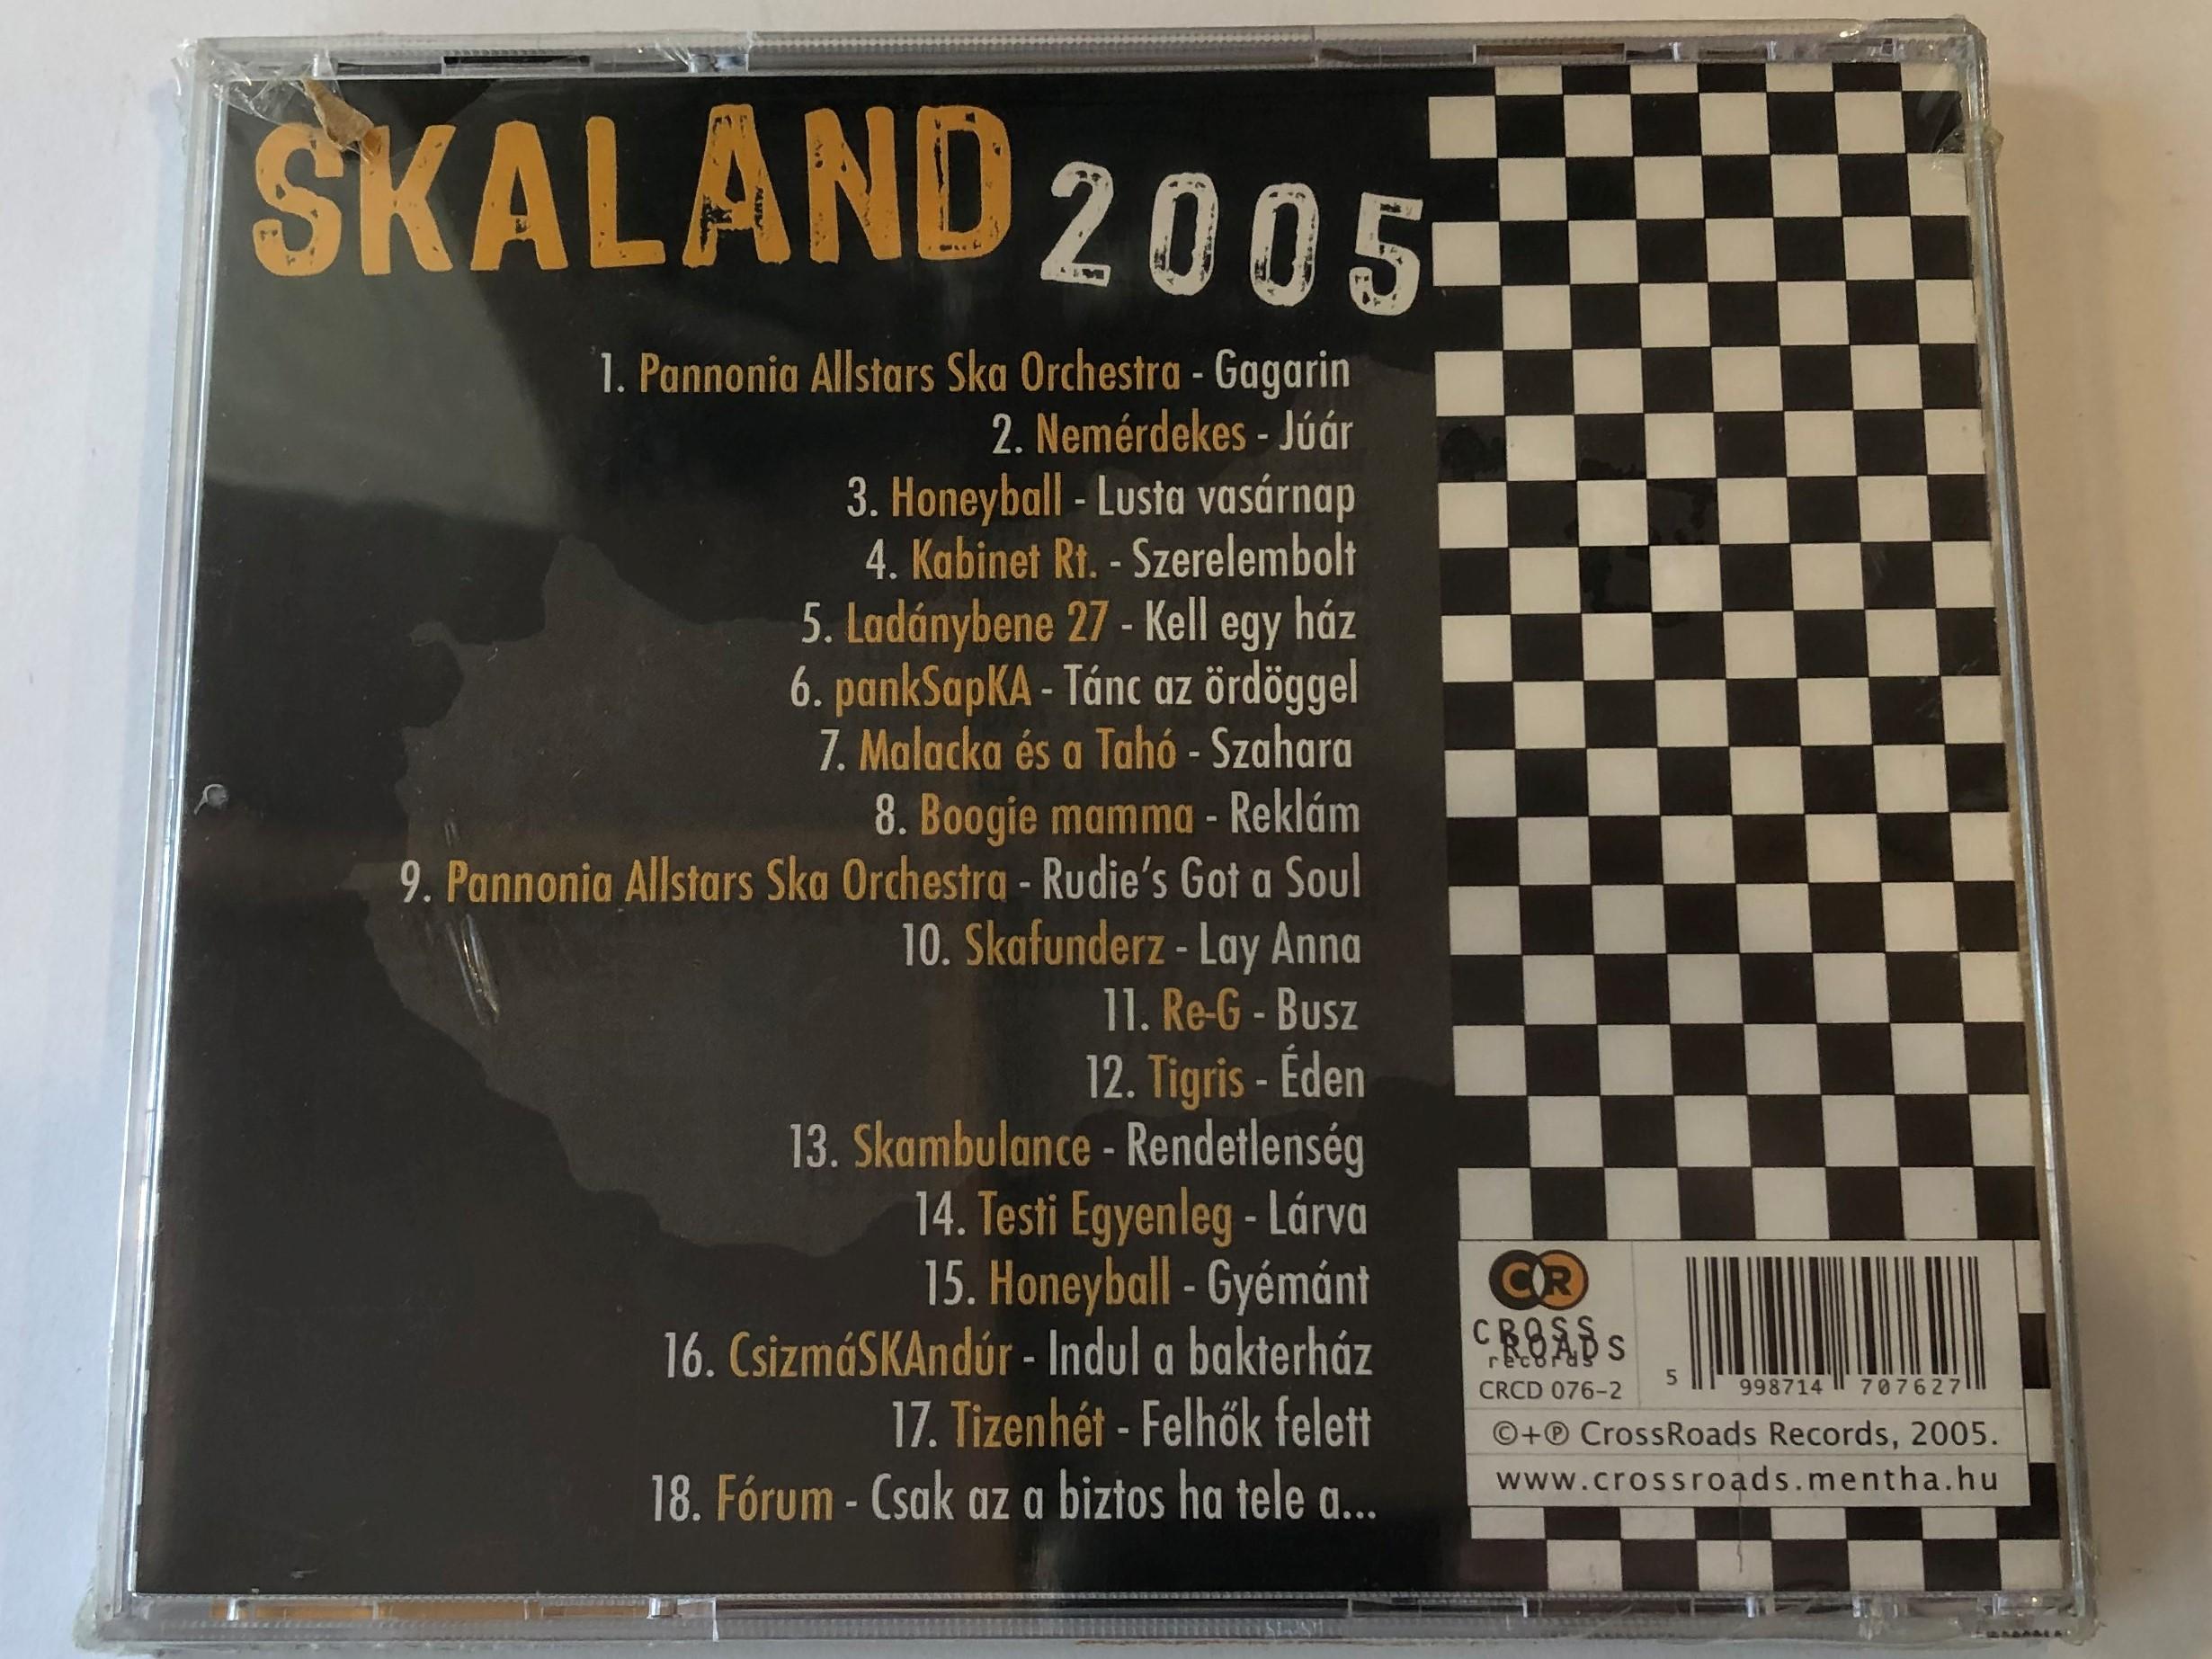 skaland-2005-pannonia-allstars-ska-orchestra-nem-rdekes-honeyball-kabinet-rt.-lad-nybene-27-boogie-mamma-f-rum-malacka-s-a-tah-panksapka-re-g-skafunderz-skambulance-crossroads-r.jpg